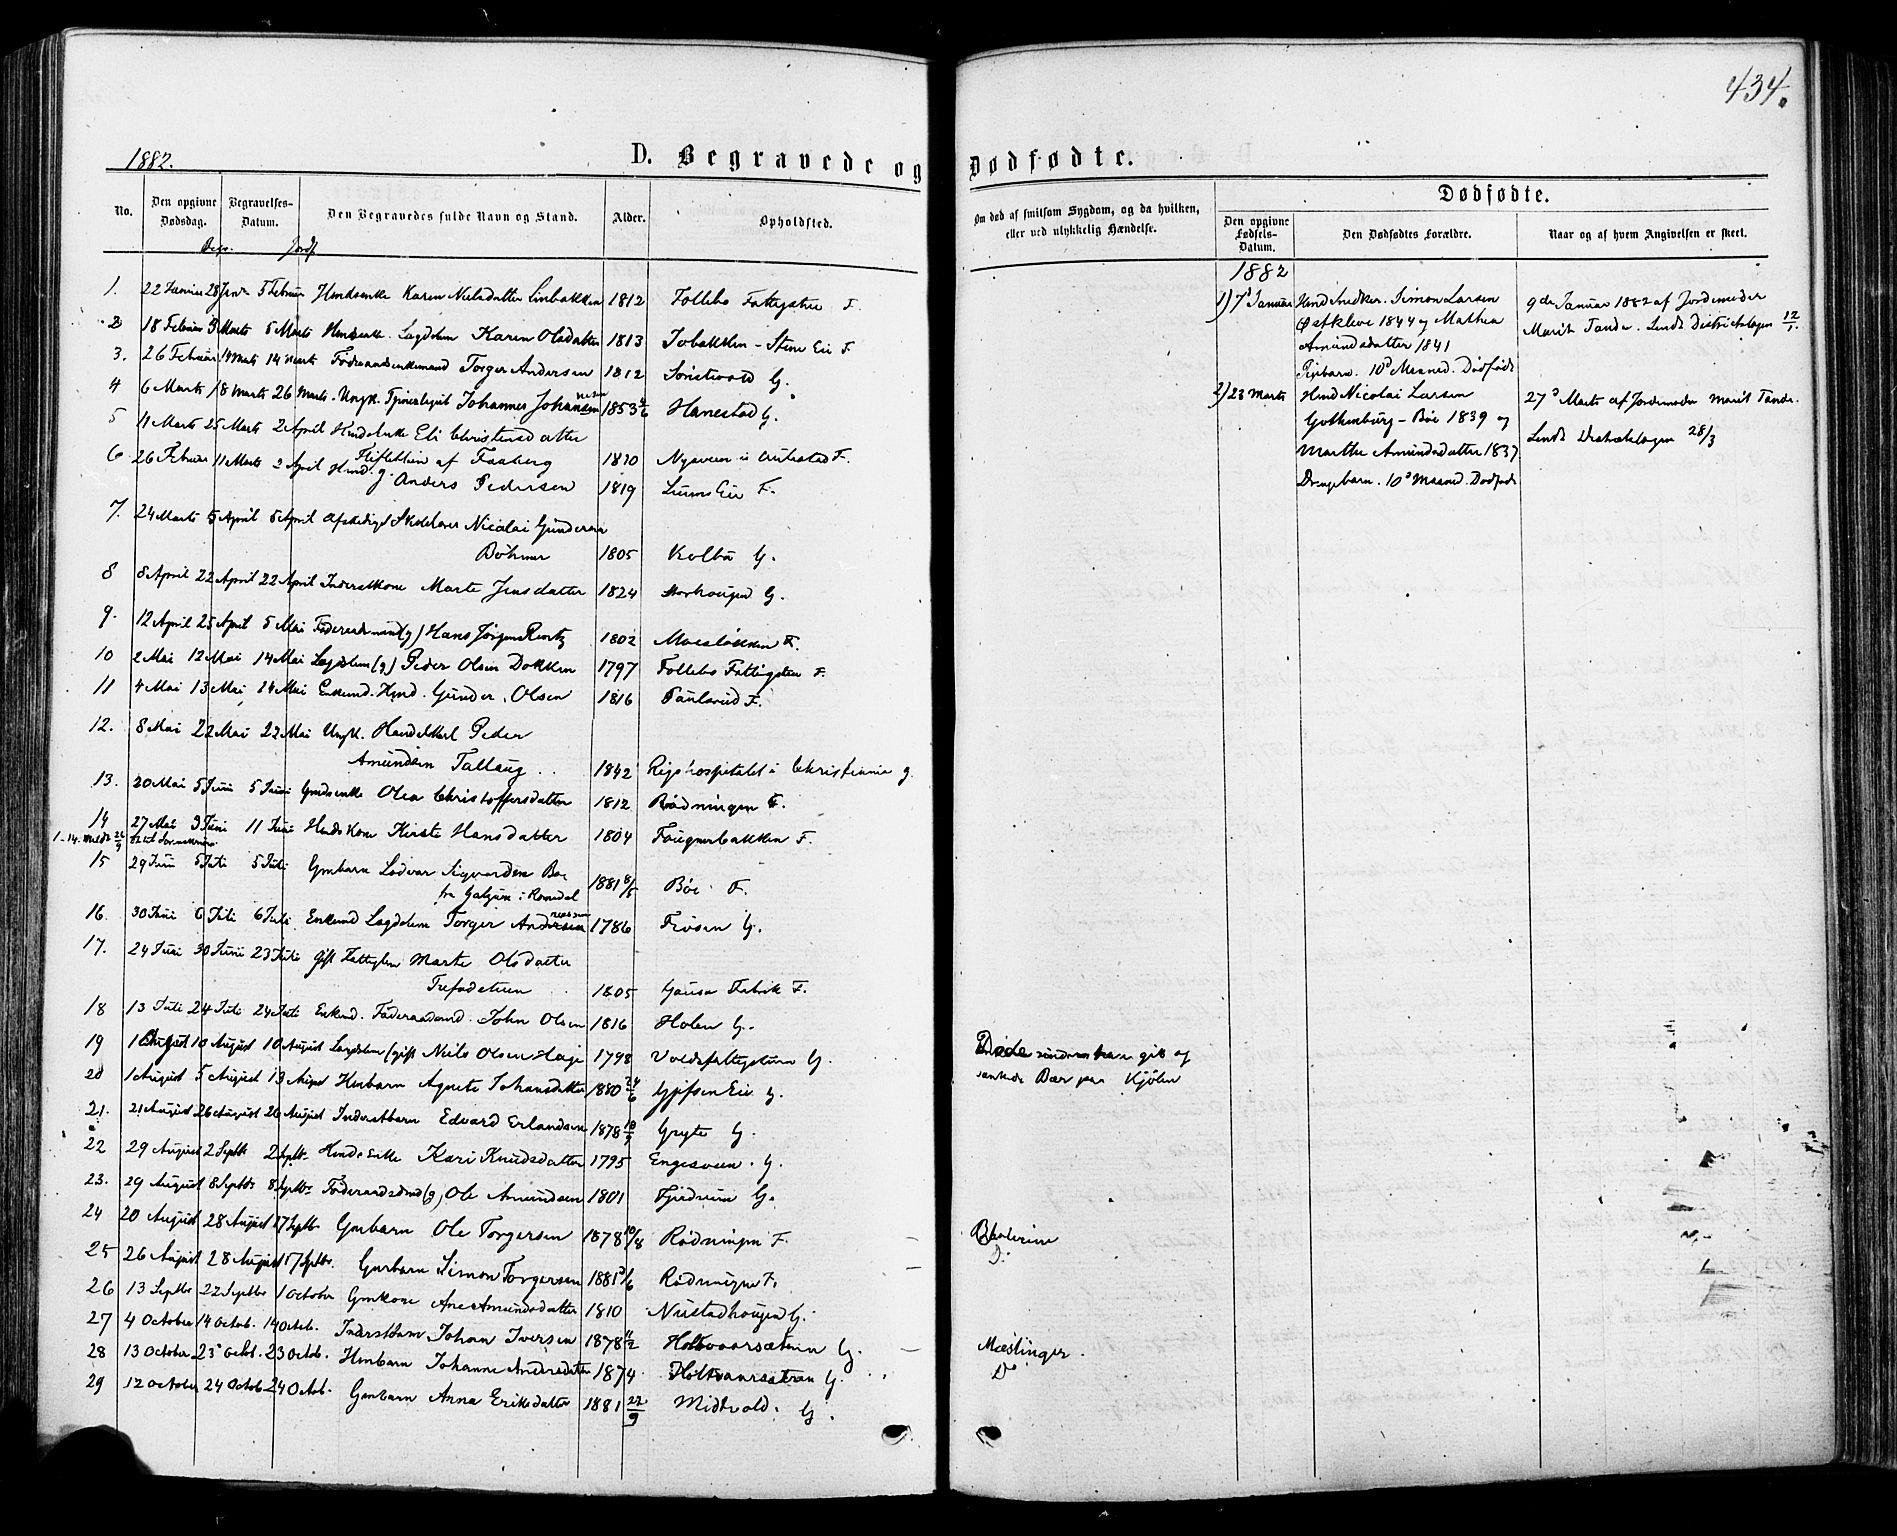 SAH, Østre Gausdal prestekontor, Ministerialbok nr. 1, 1874-1886, s. 434